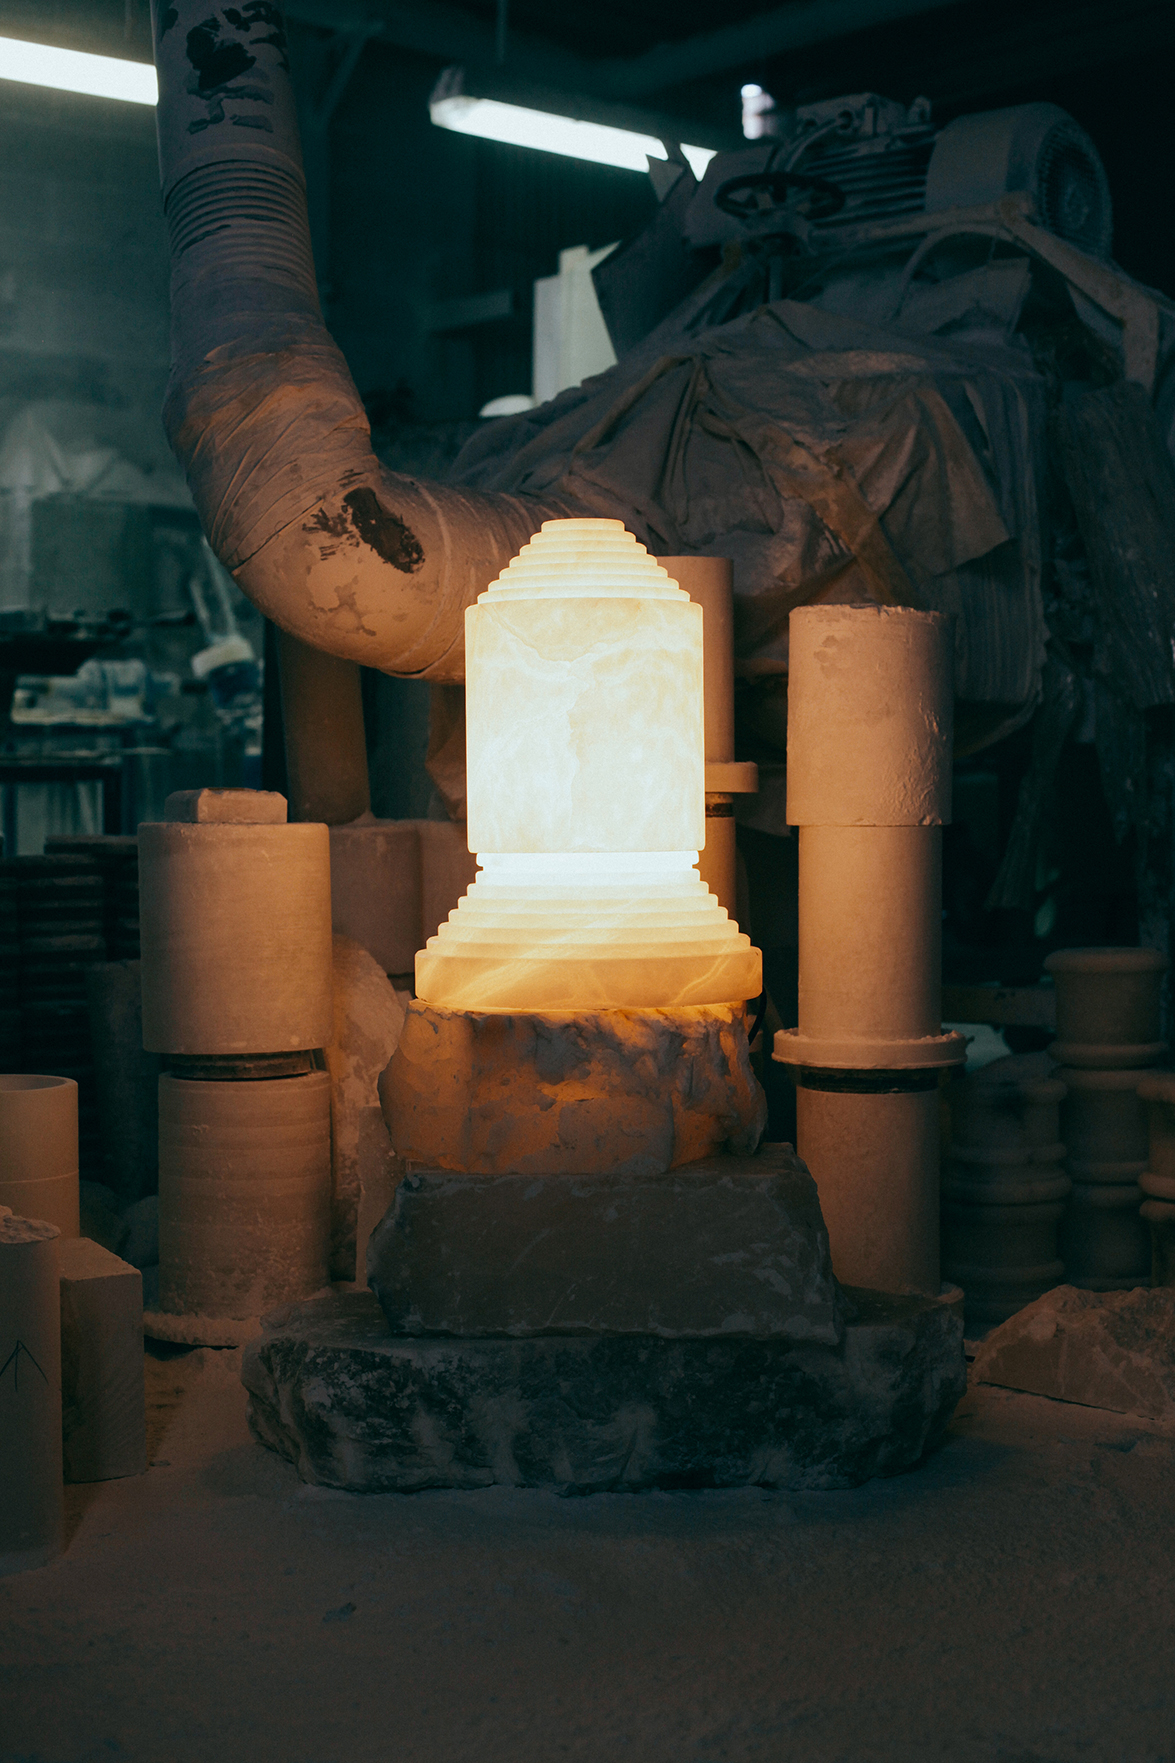 santacole_table_lamps_babel_humm__iris_4